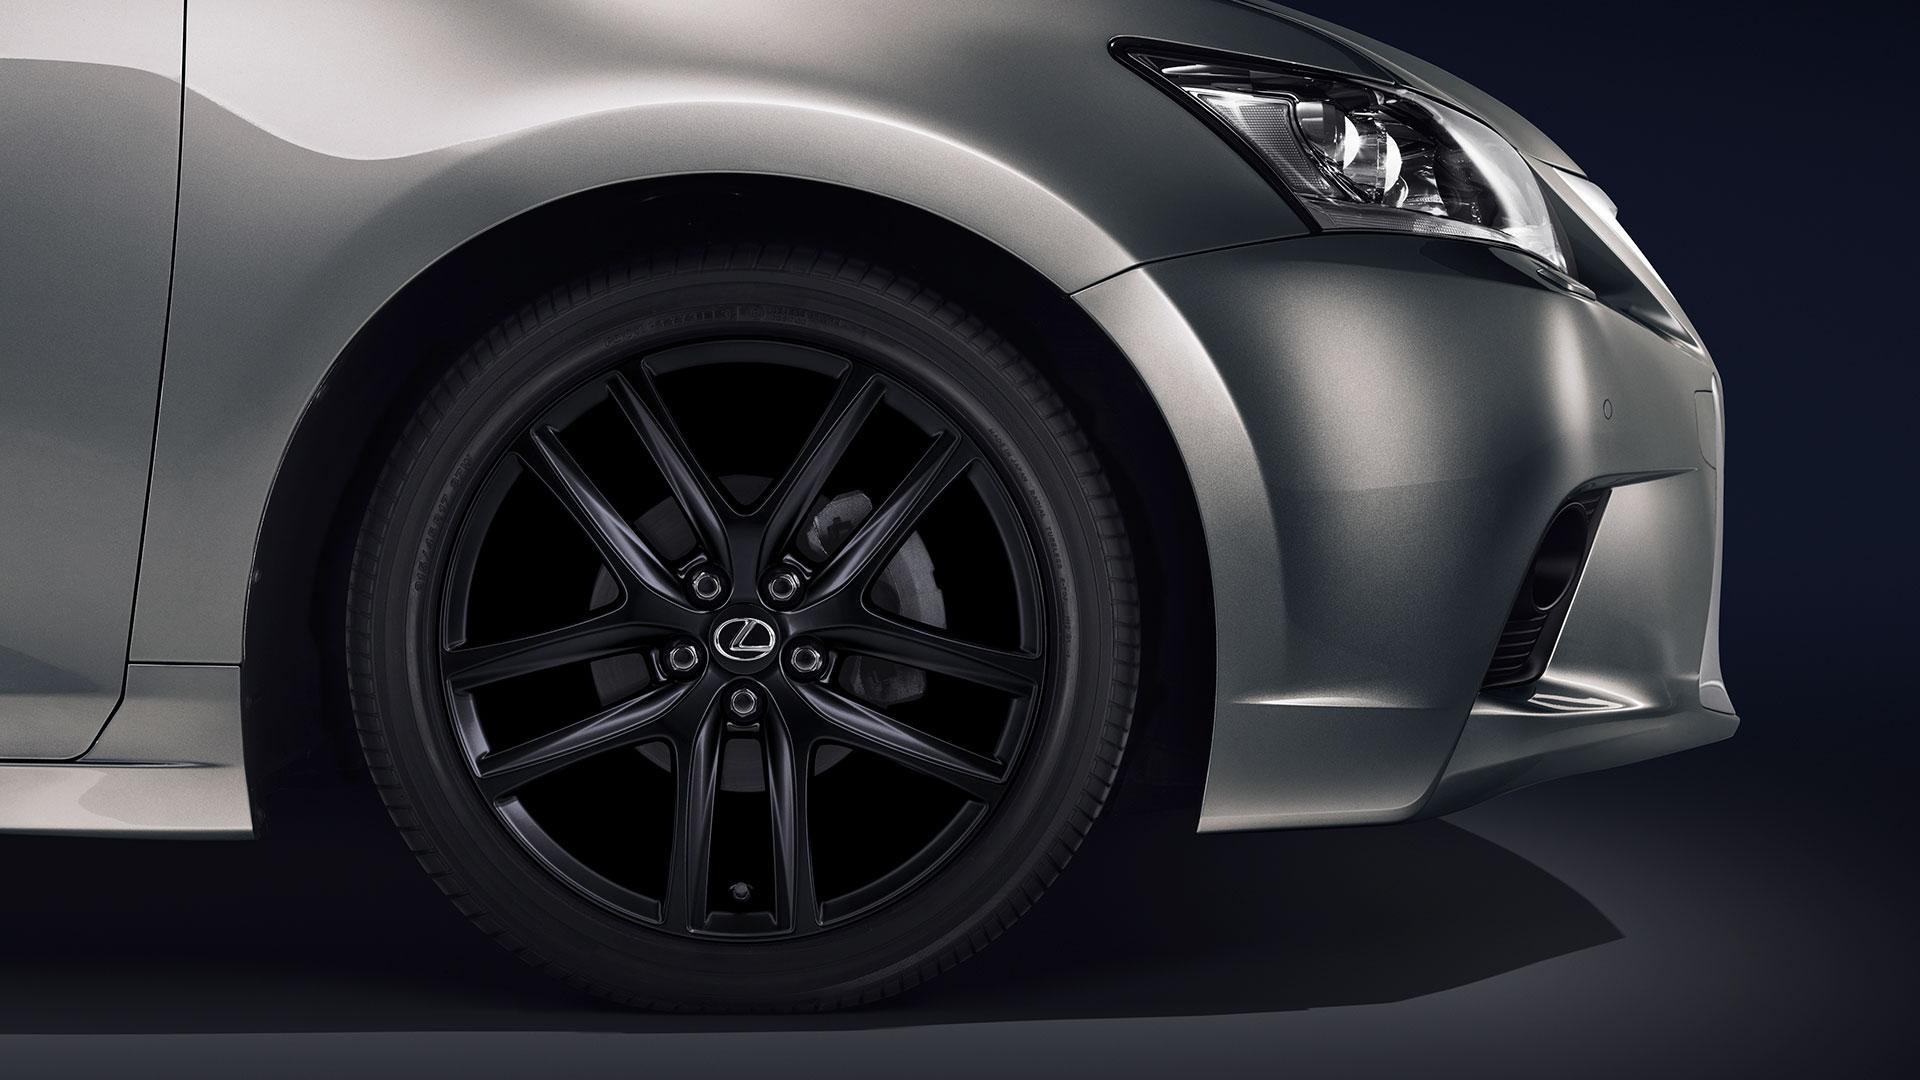 Nueva gama 2013 para el Lexus CT 200h hero asset